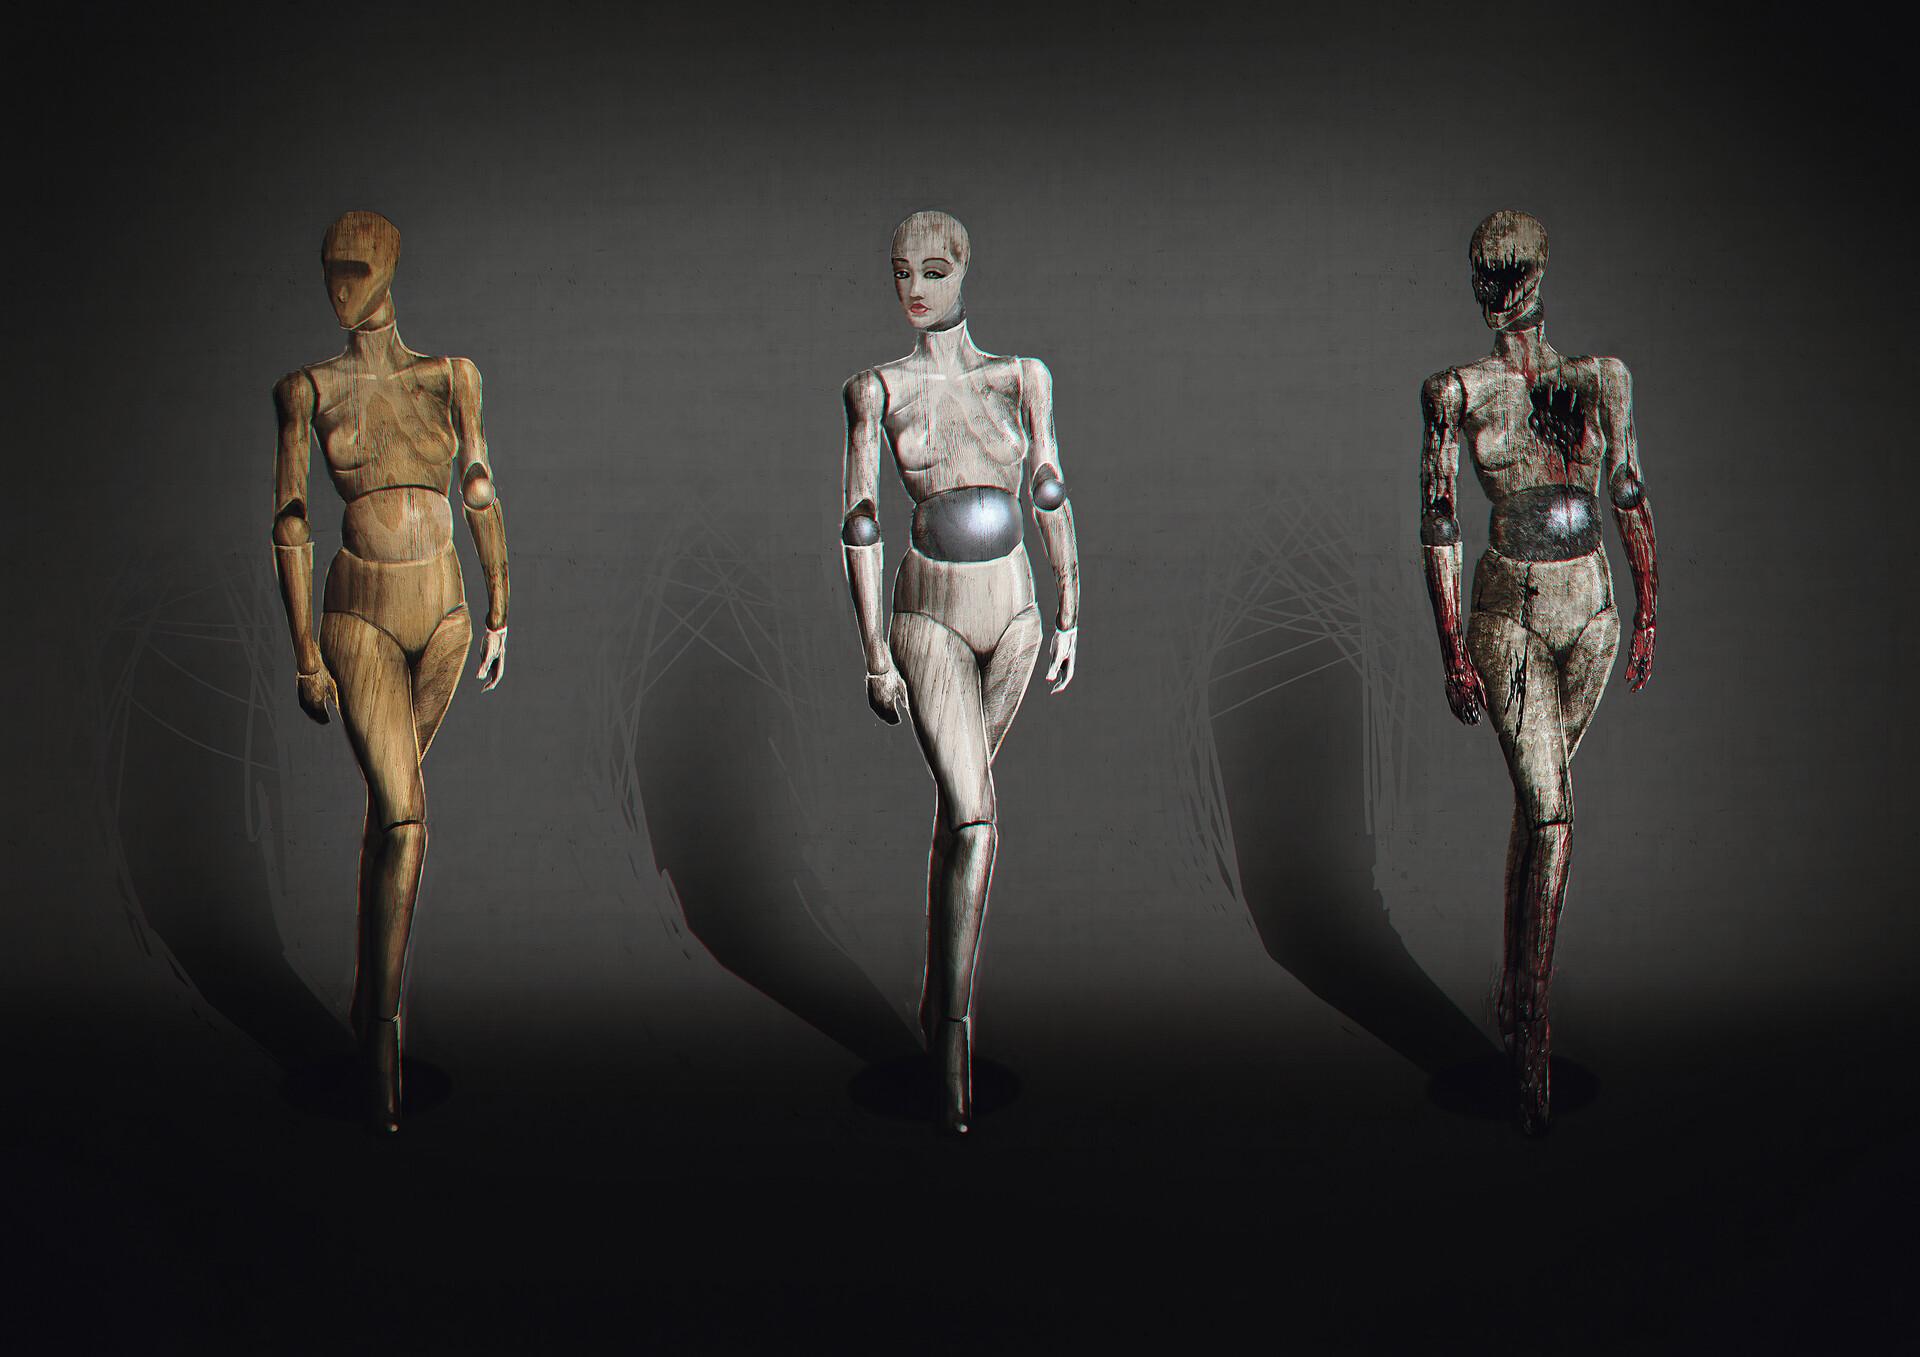 Fatih gurdal mannequin